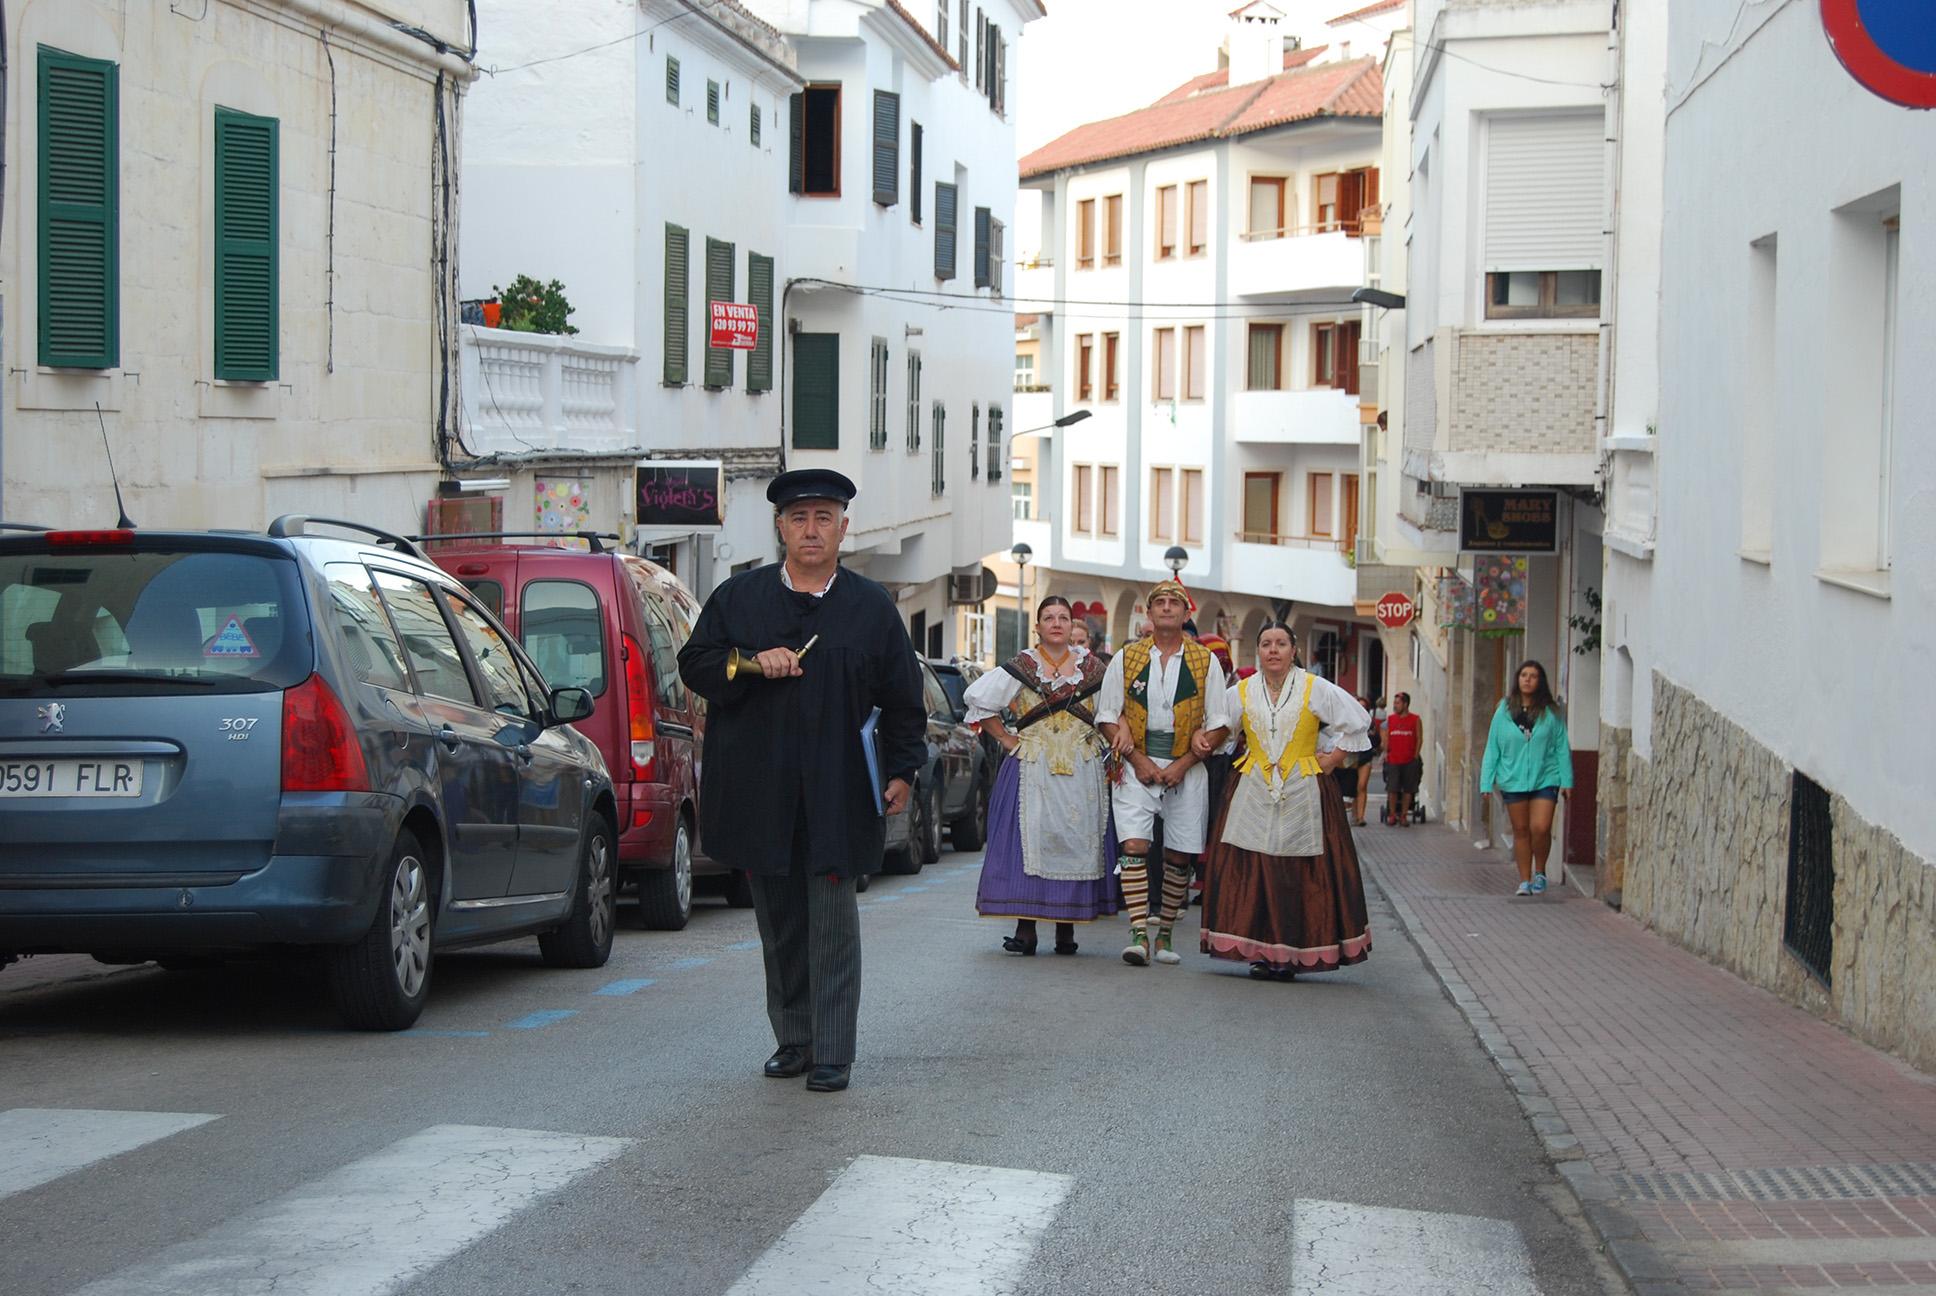 2014-08-15al17 BALADRE a Ferreries PepVerdu (325)